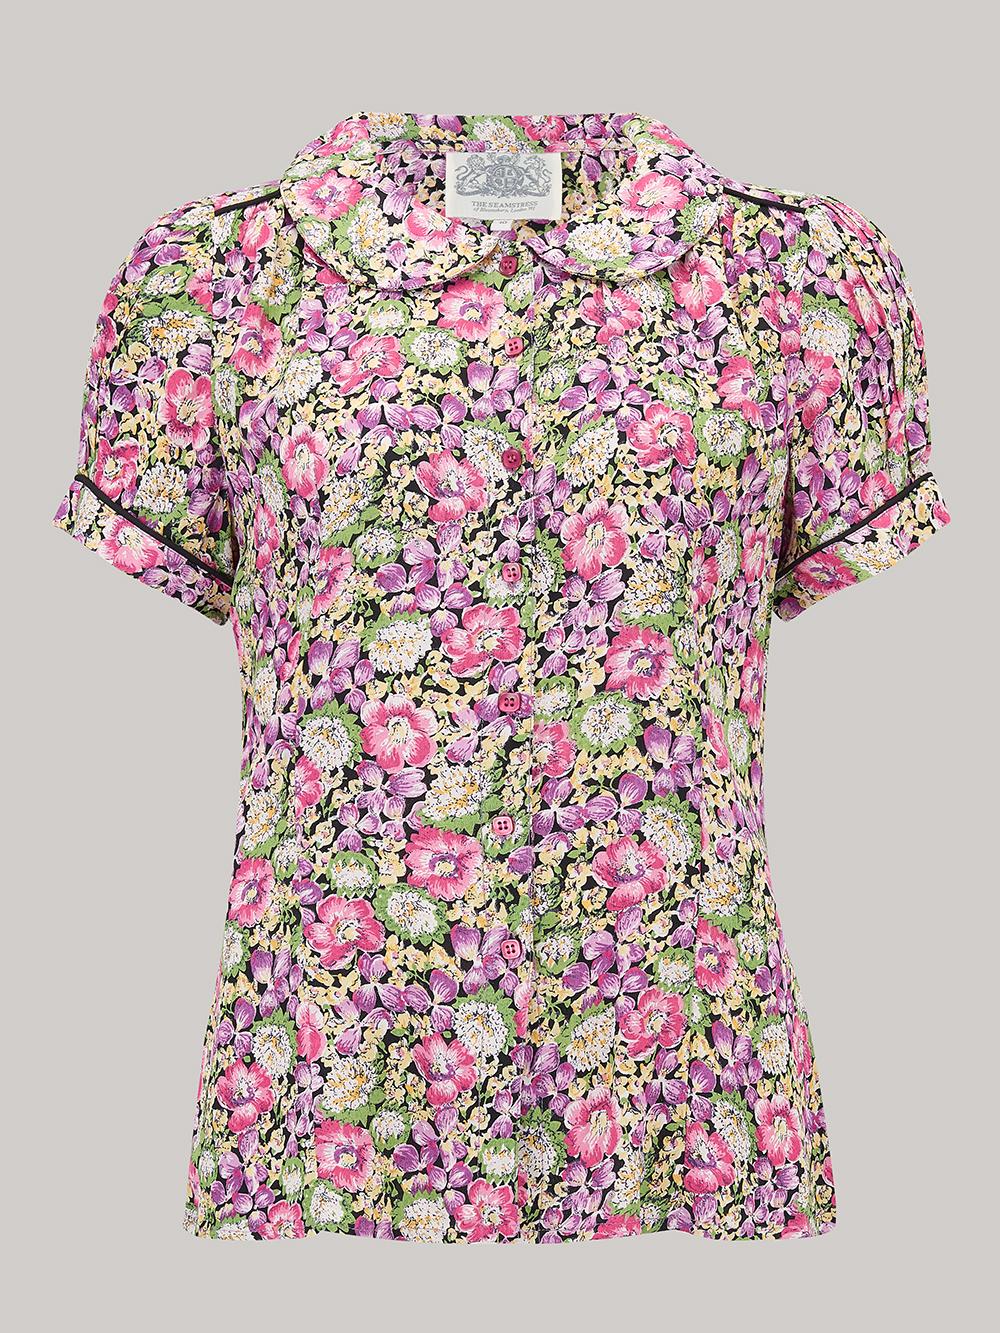 1940s Dresses and Clothing UK | 40s Shoes UK Jive Blouse - LiliacPink Flower 8 £39.00 AT vintagedancer.com